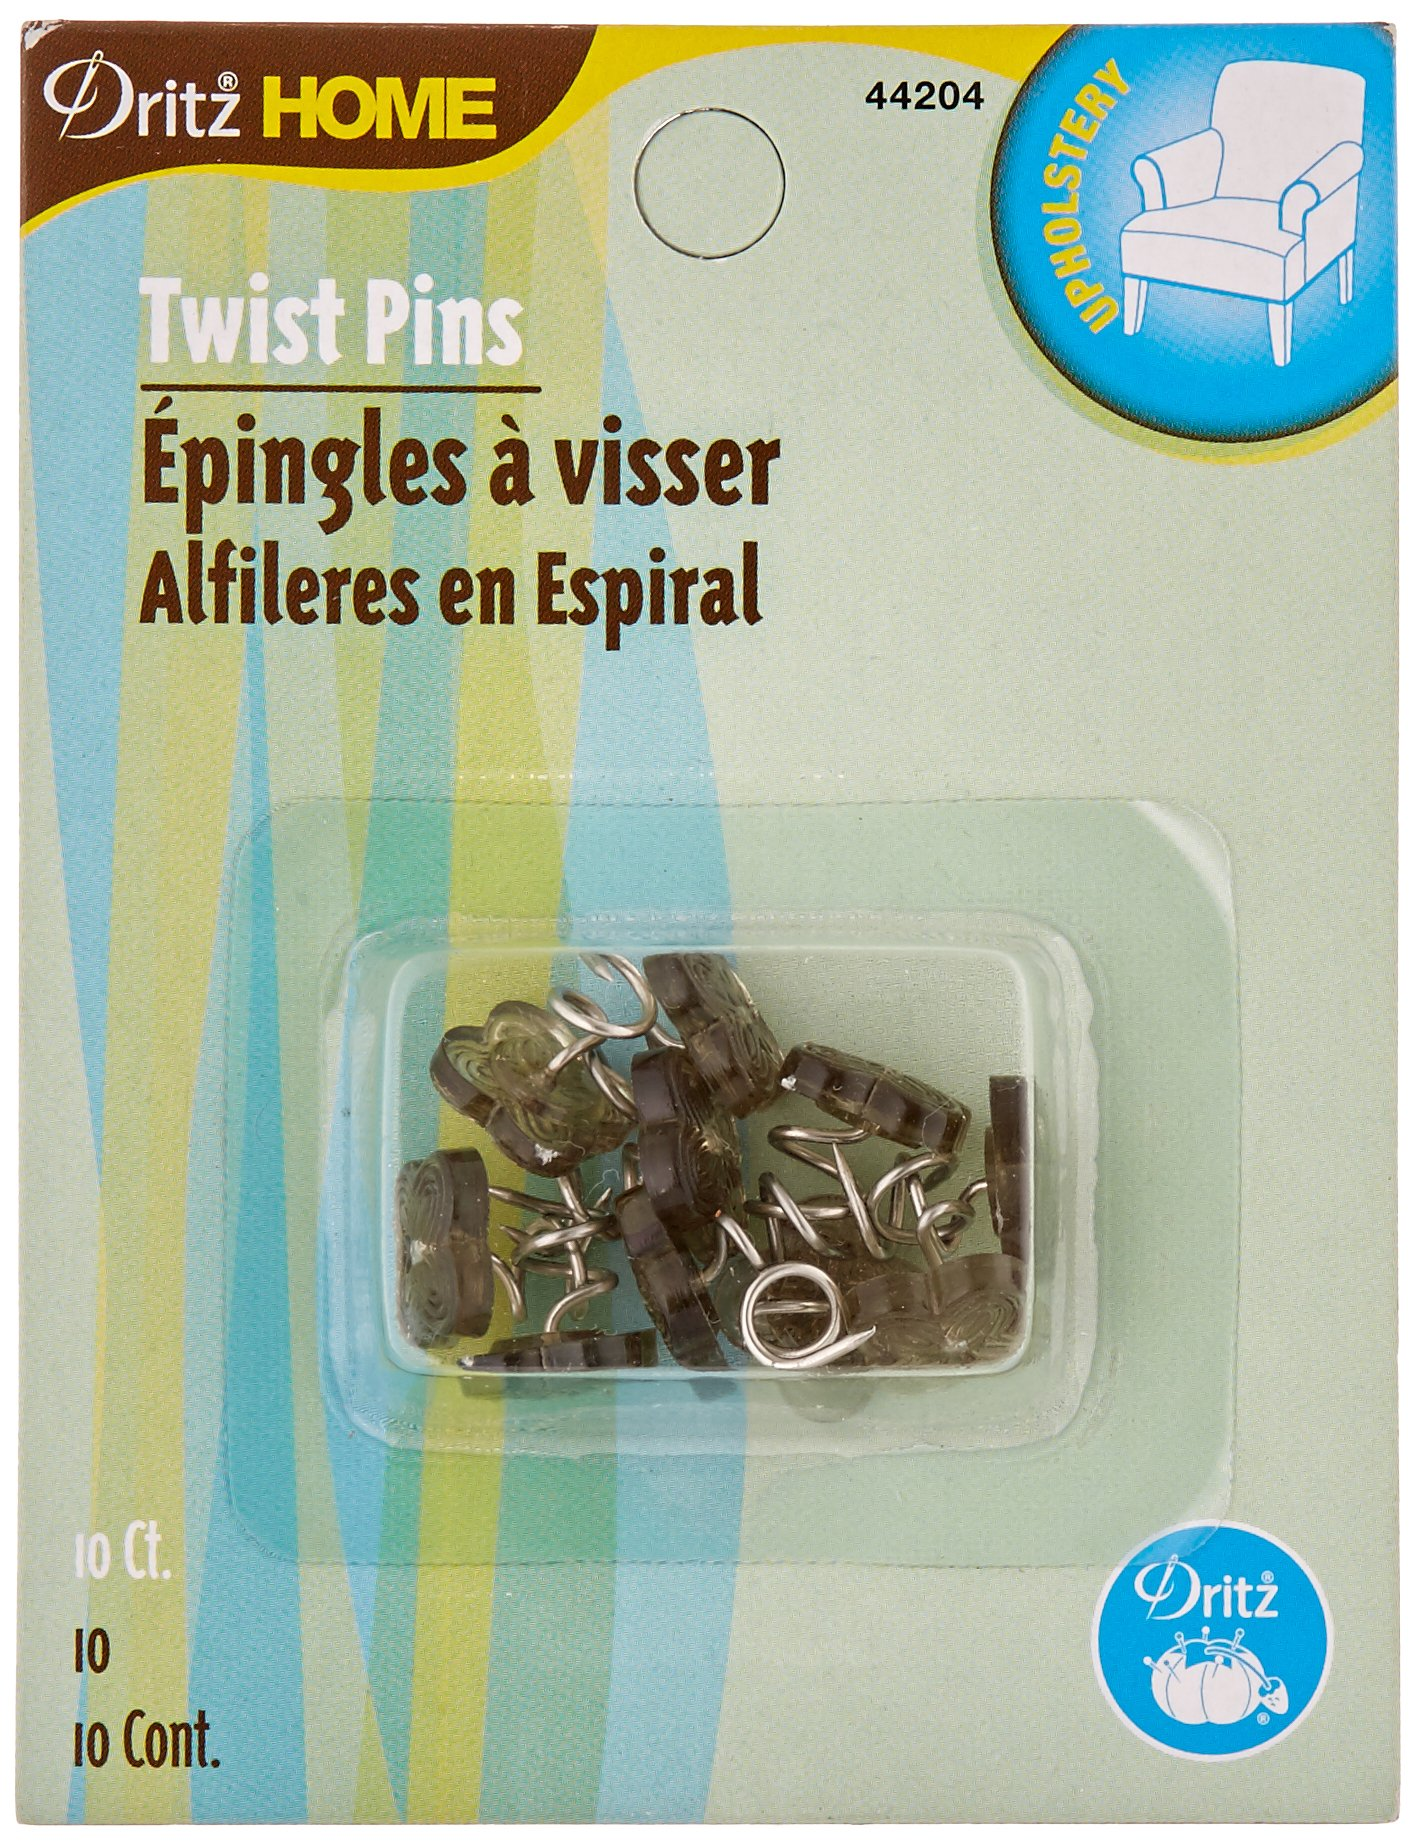 Dritz Home 44204 Twist Pins with Decorative Heads, Smoke Tint (10-Piece)